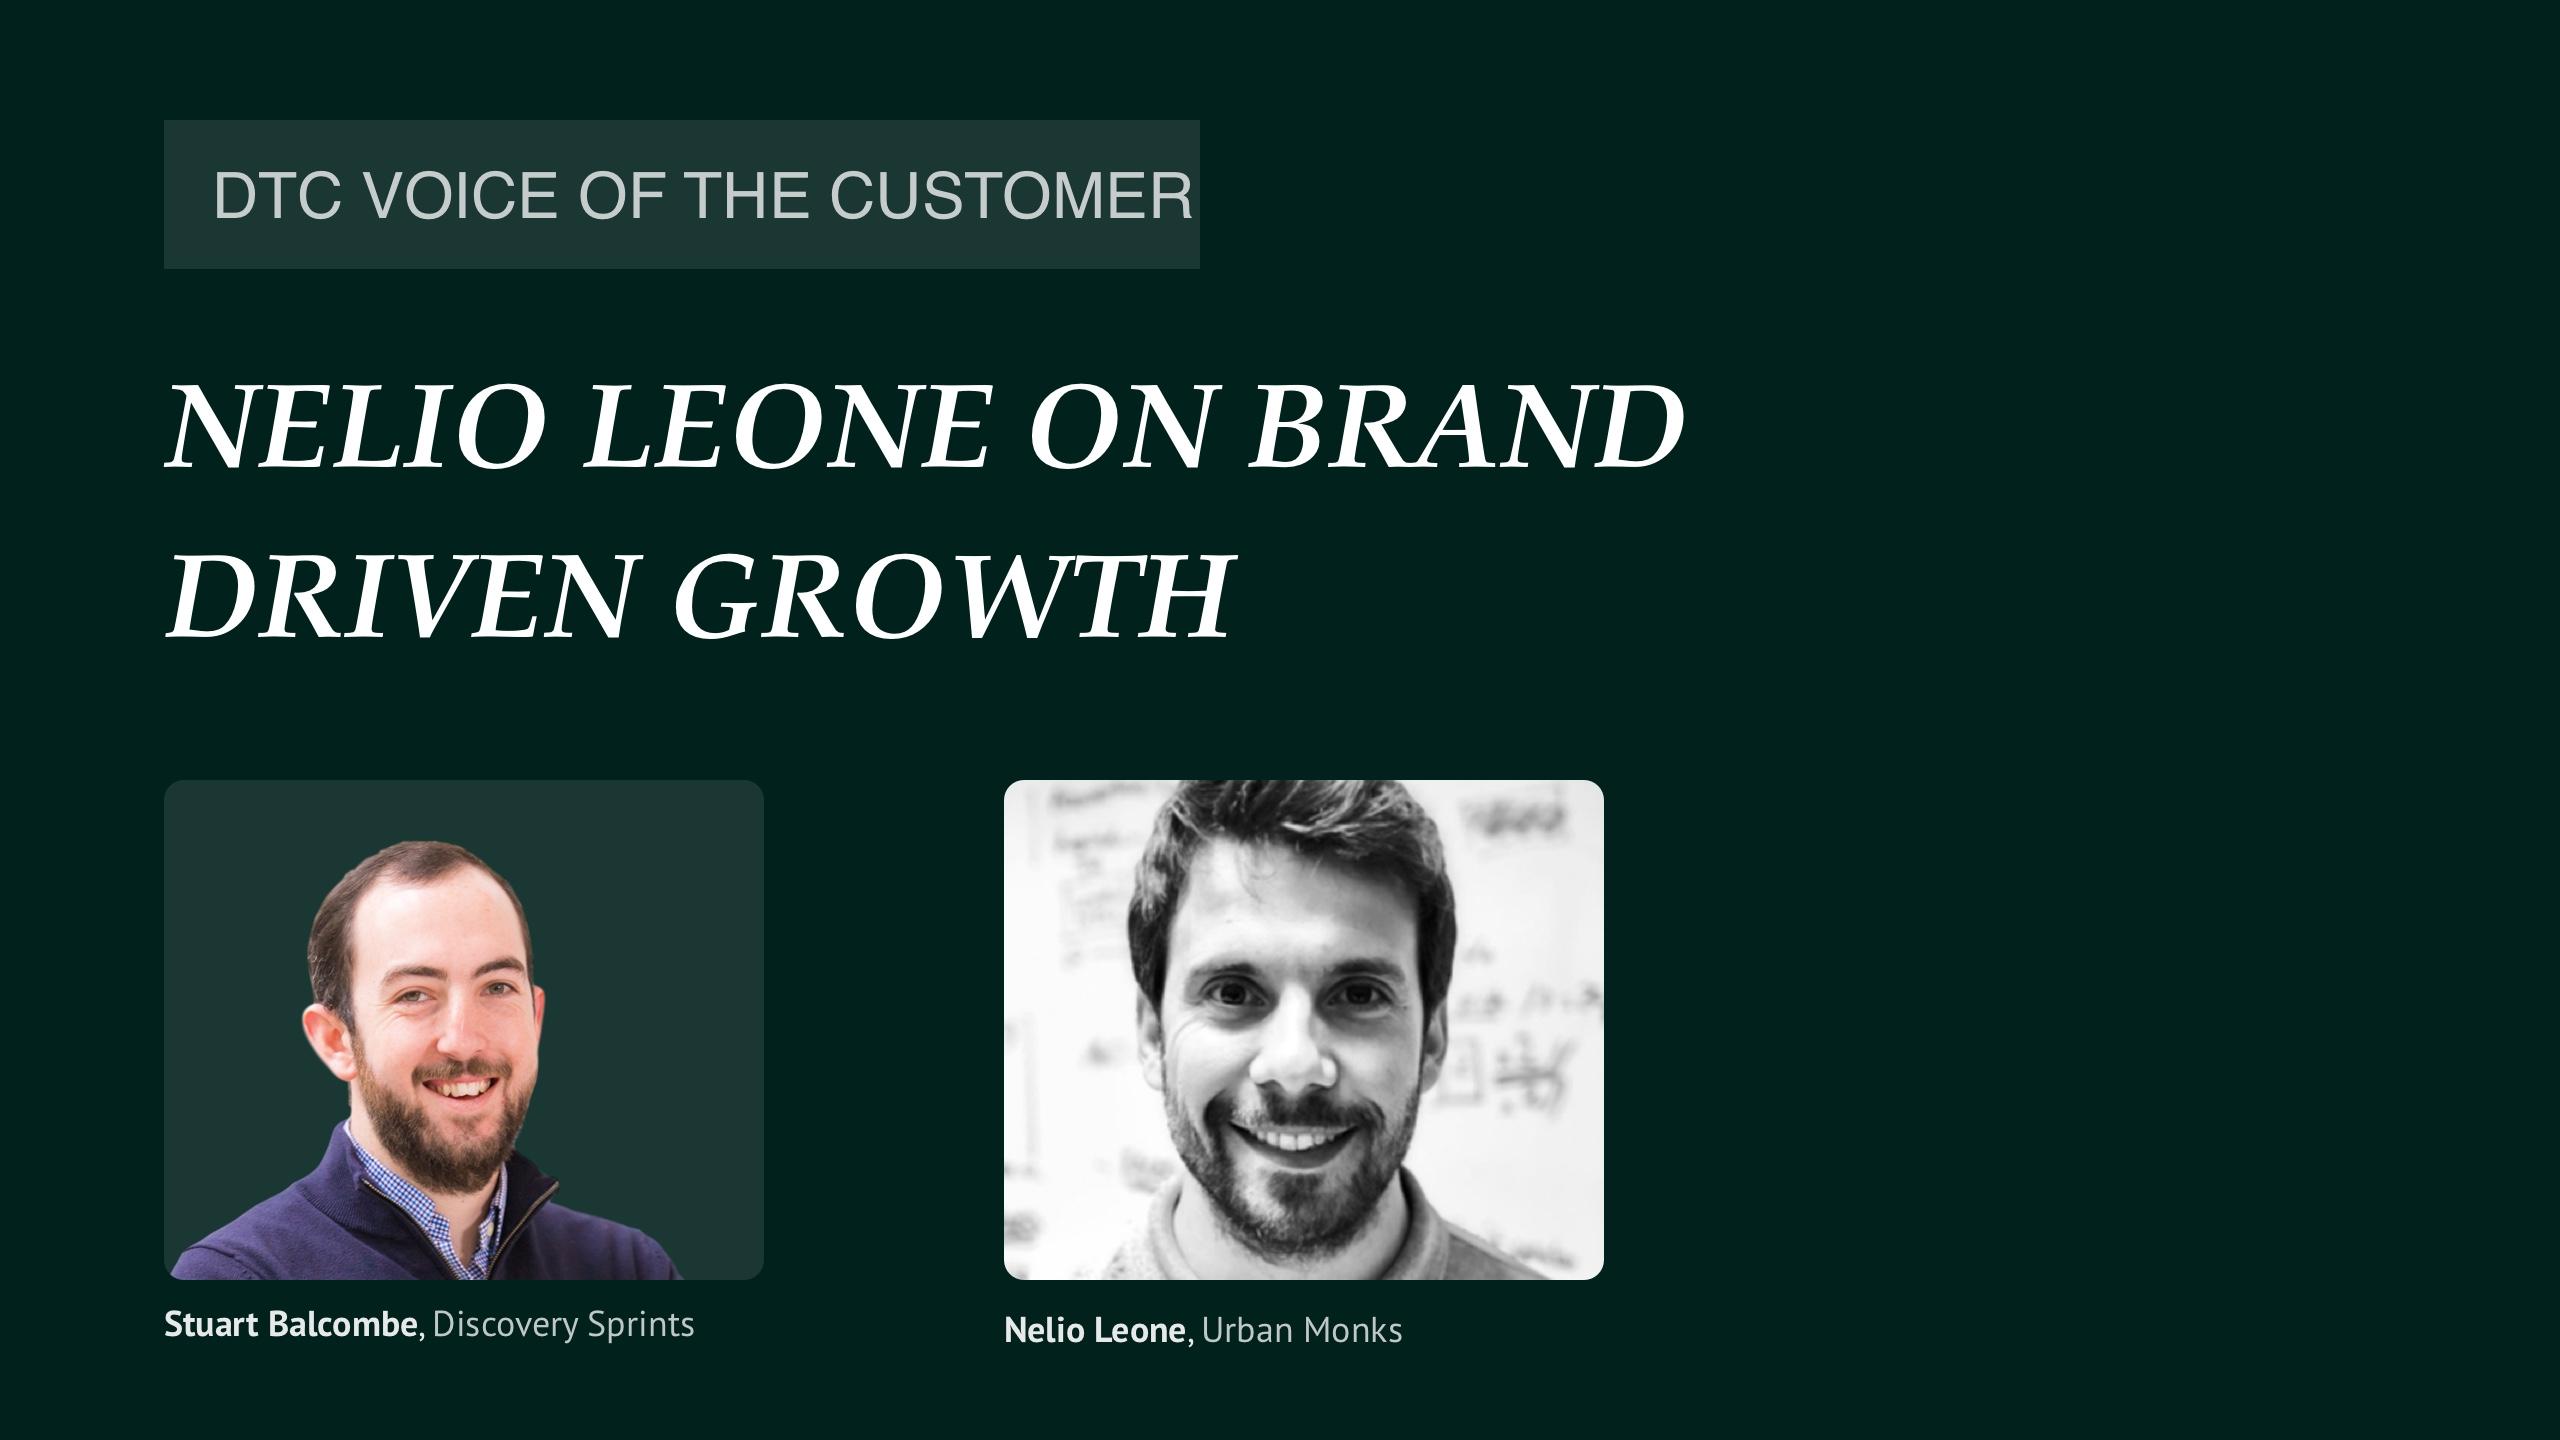 Nelio Leone on brand driven growth